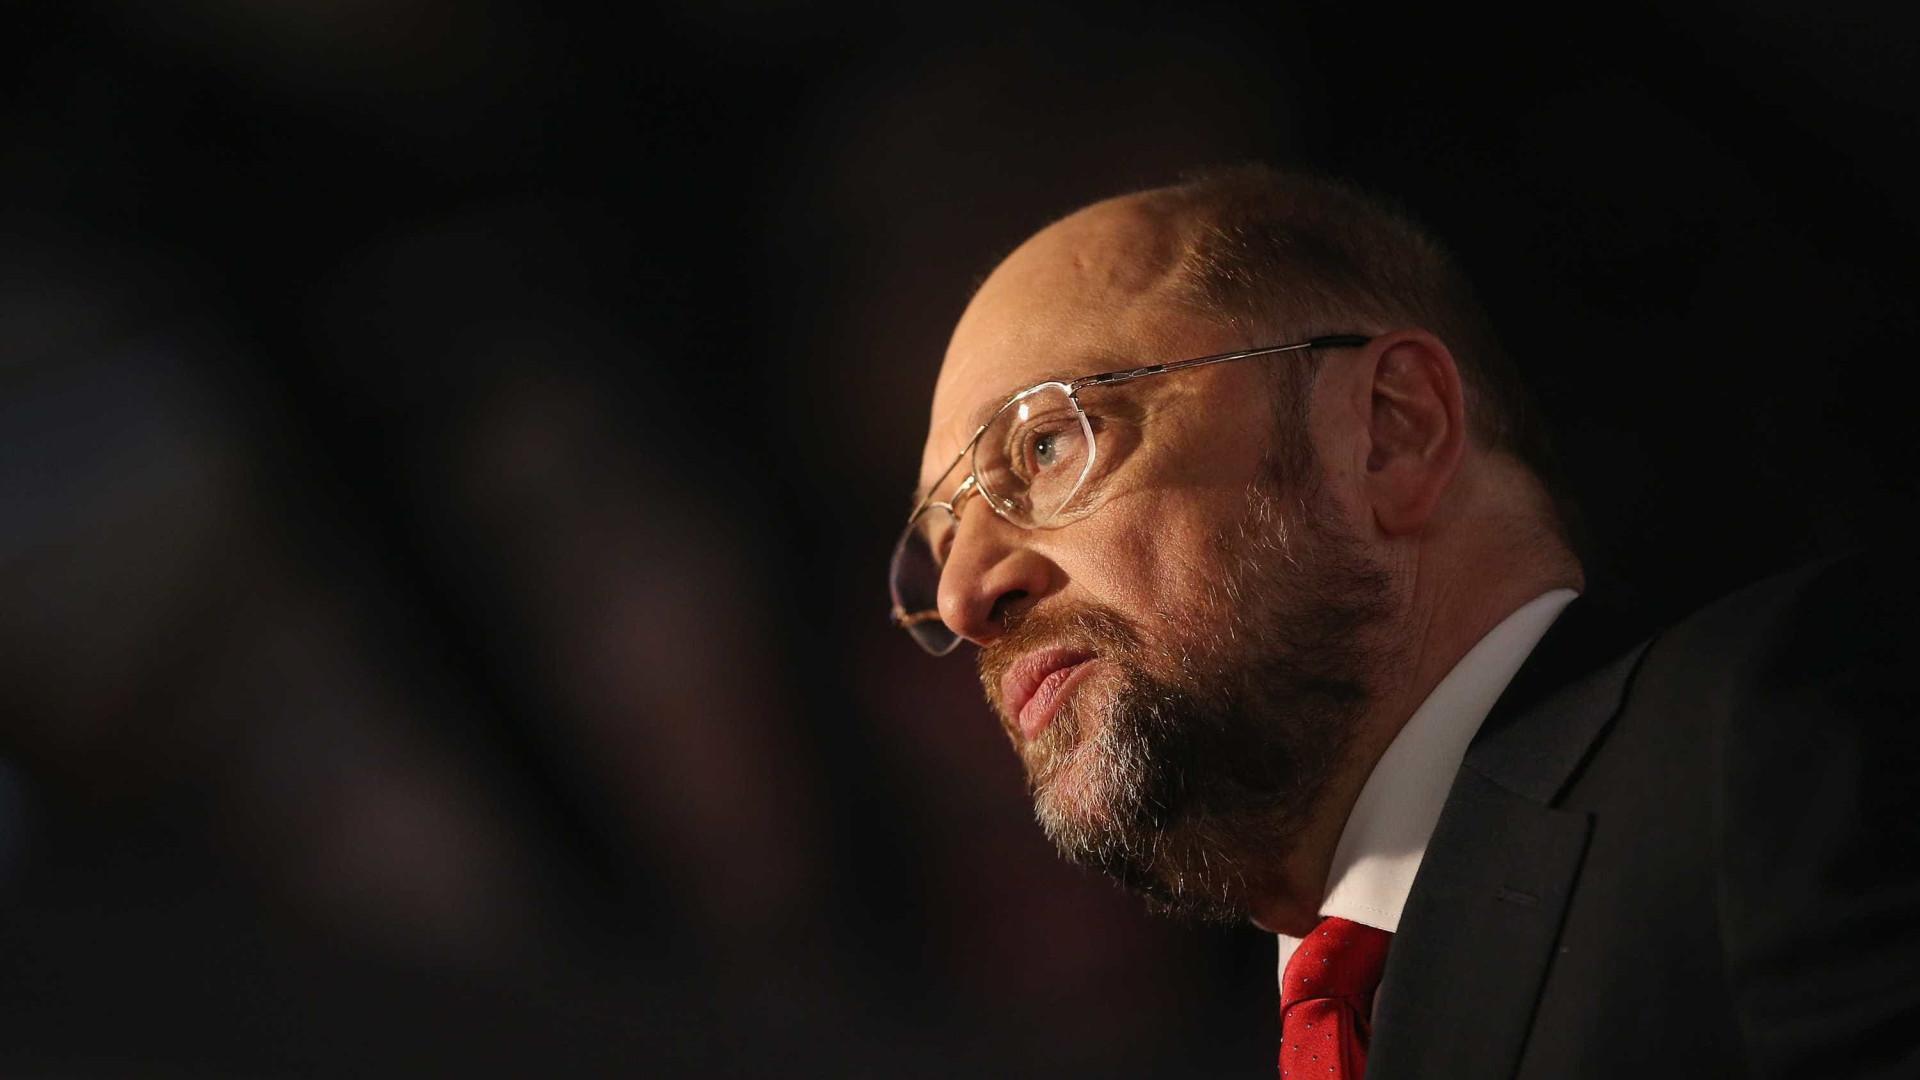 Martin Schulz anuncia abandono imediato da liderança do SPD